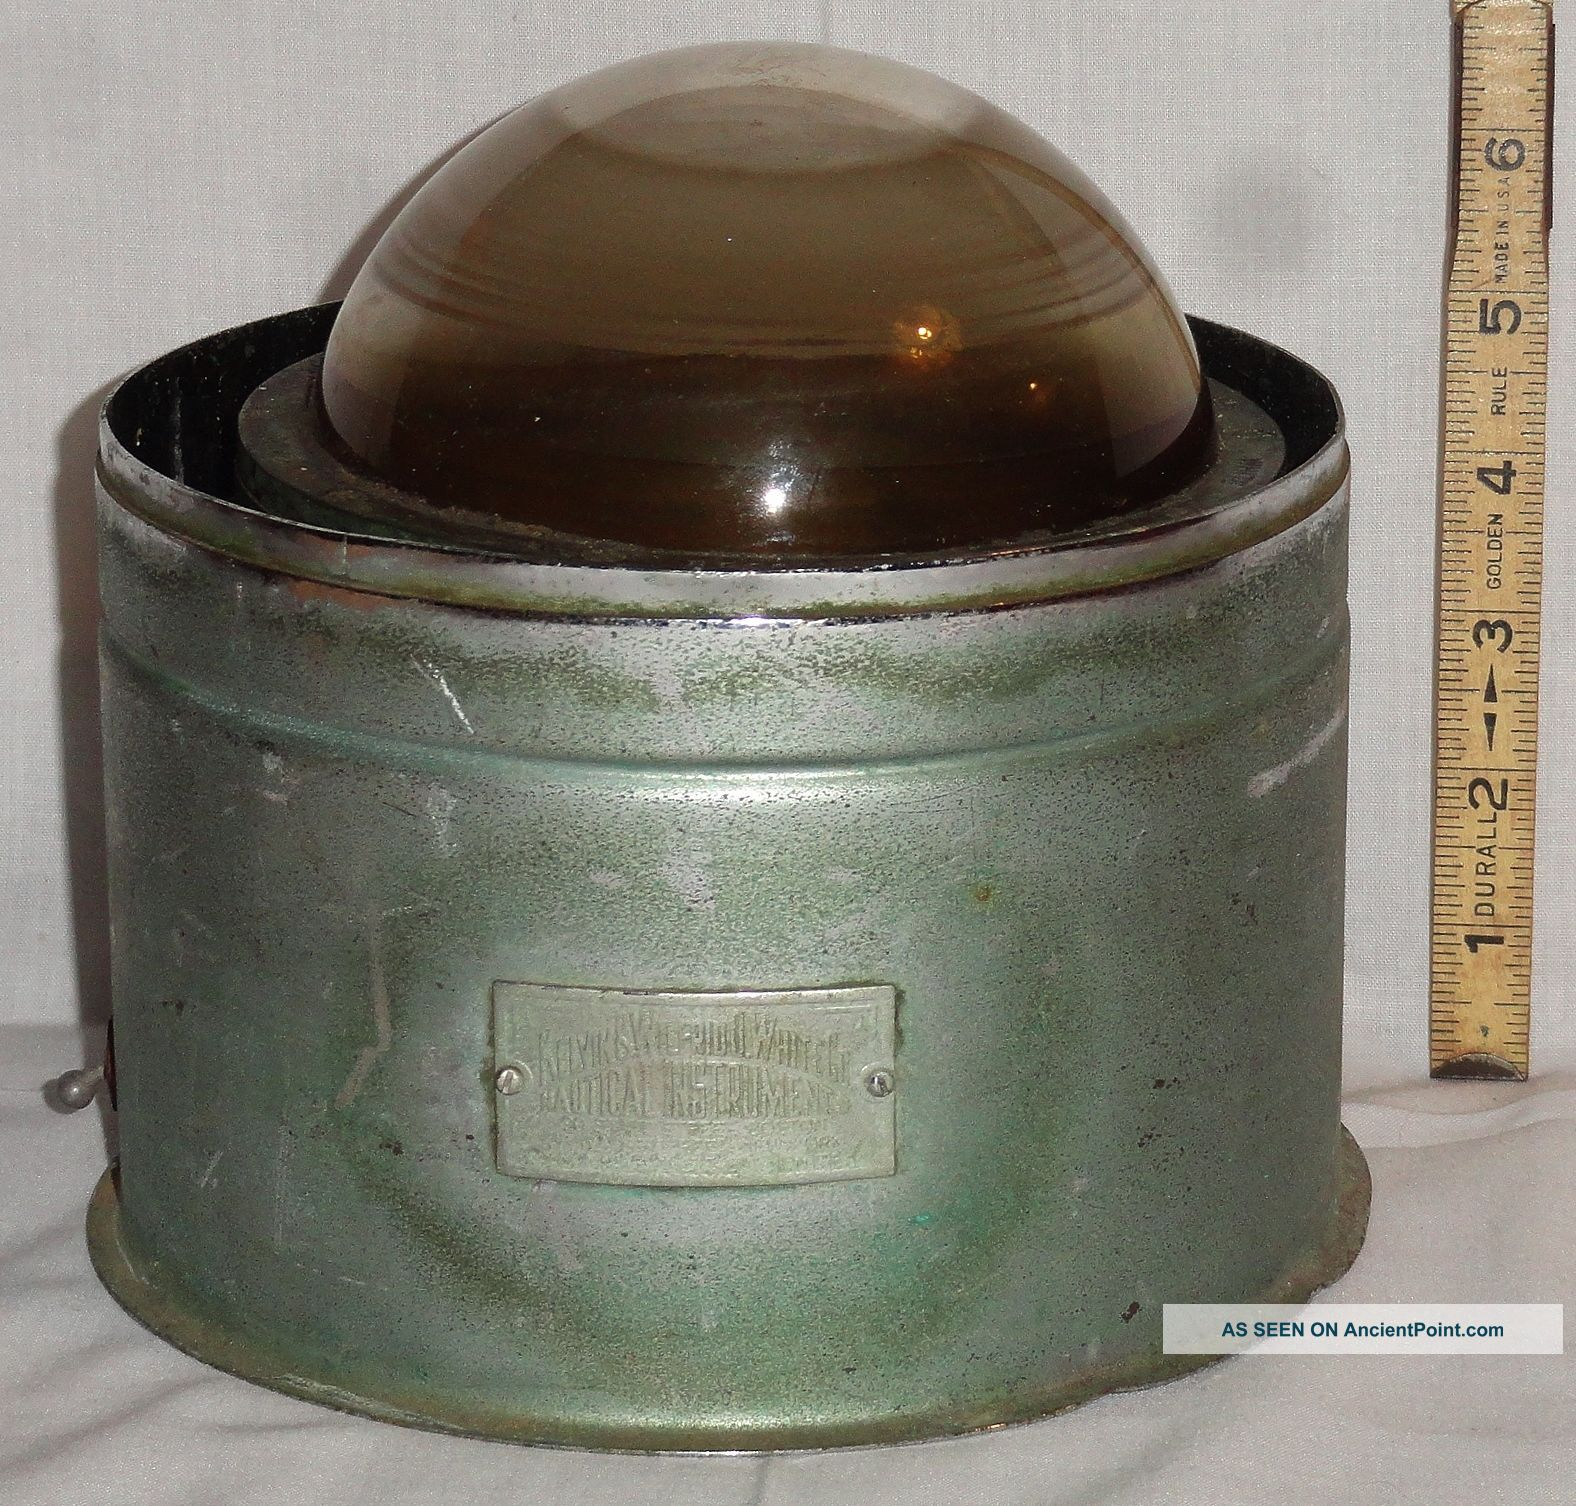 Antique Kelvin & Wilfrid Wilfred O White Binnacle Spherical Compass Restore Part Compasses photo